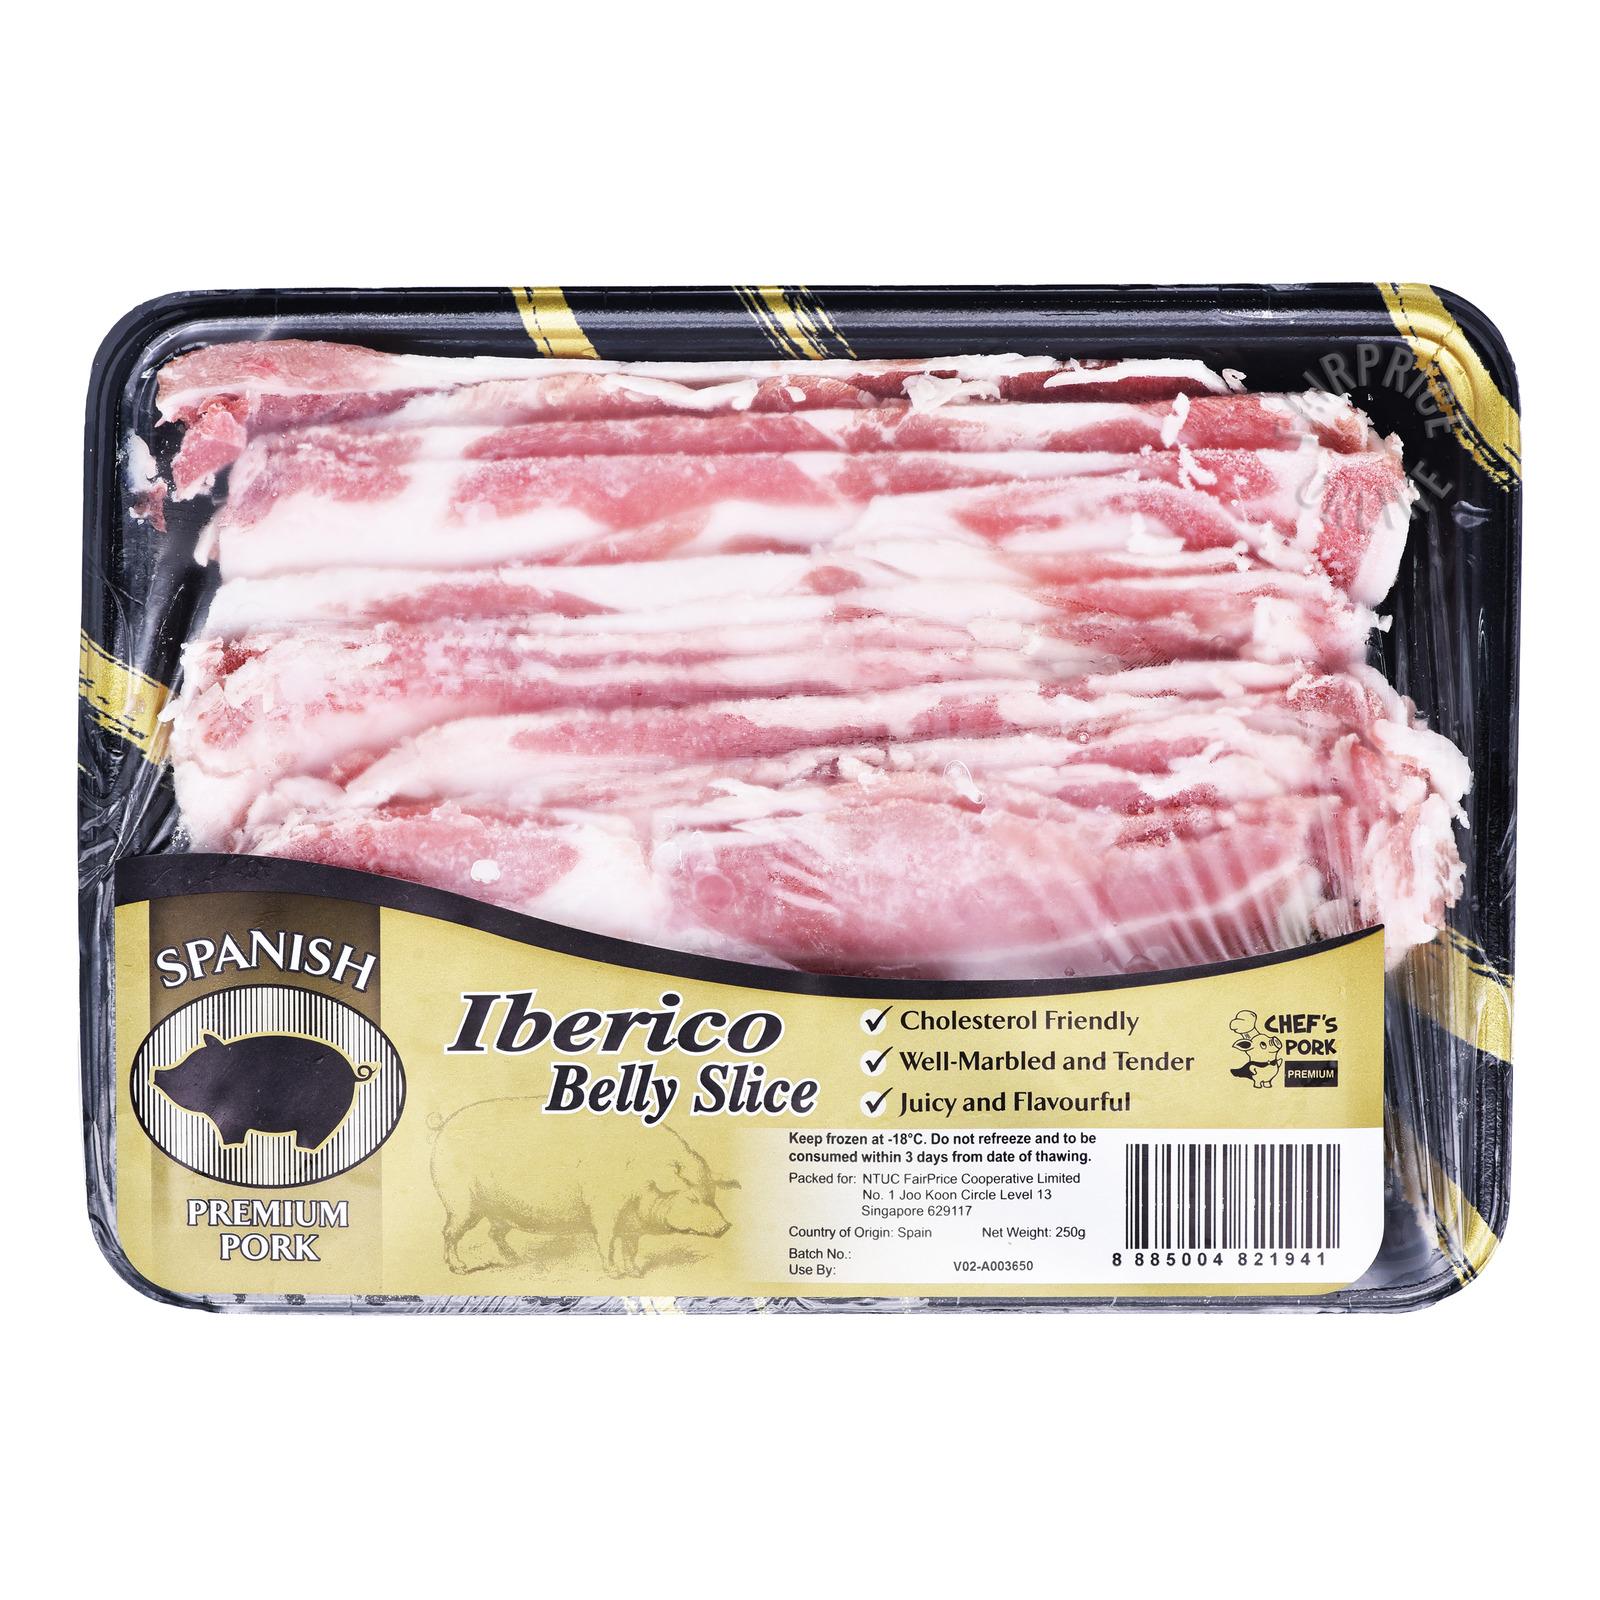 Chef's Pork Premium Frozen Iberico Belly Slice